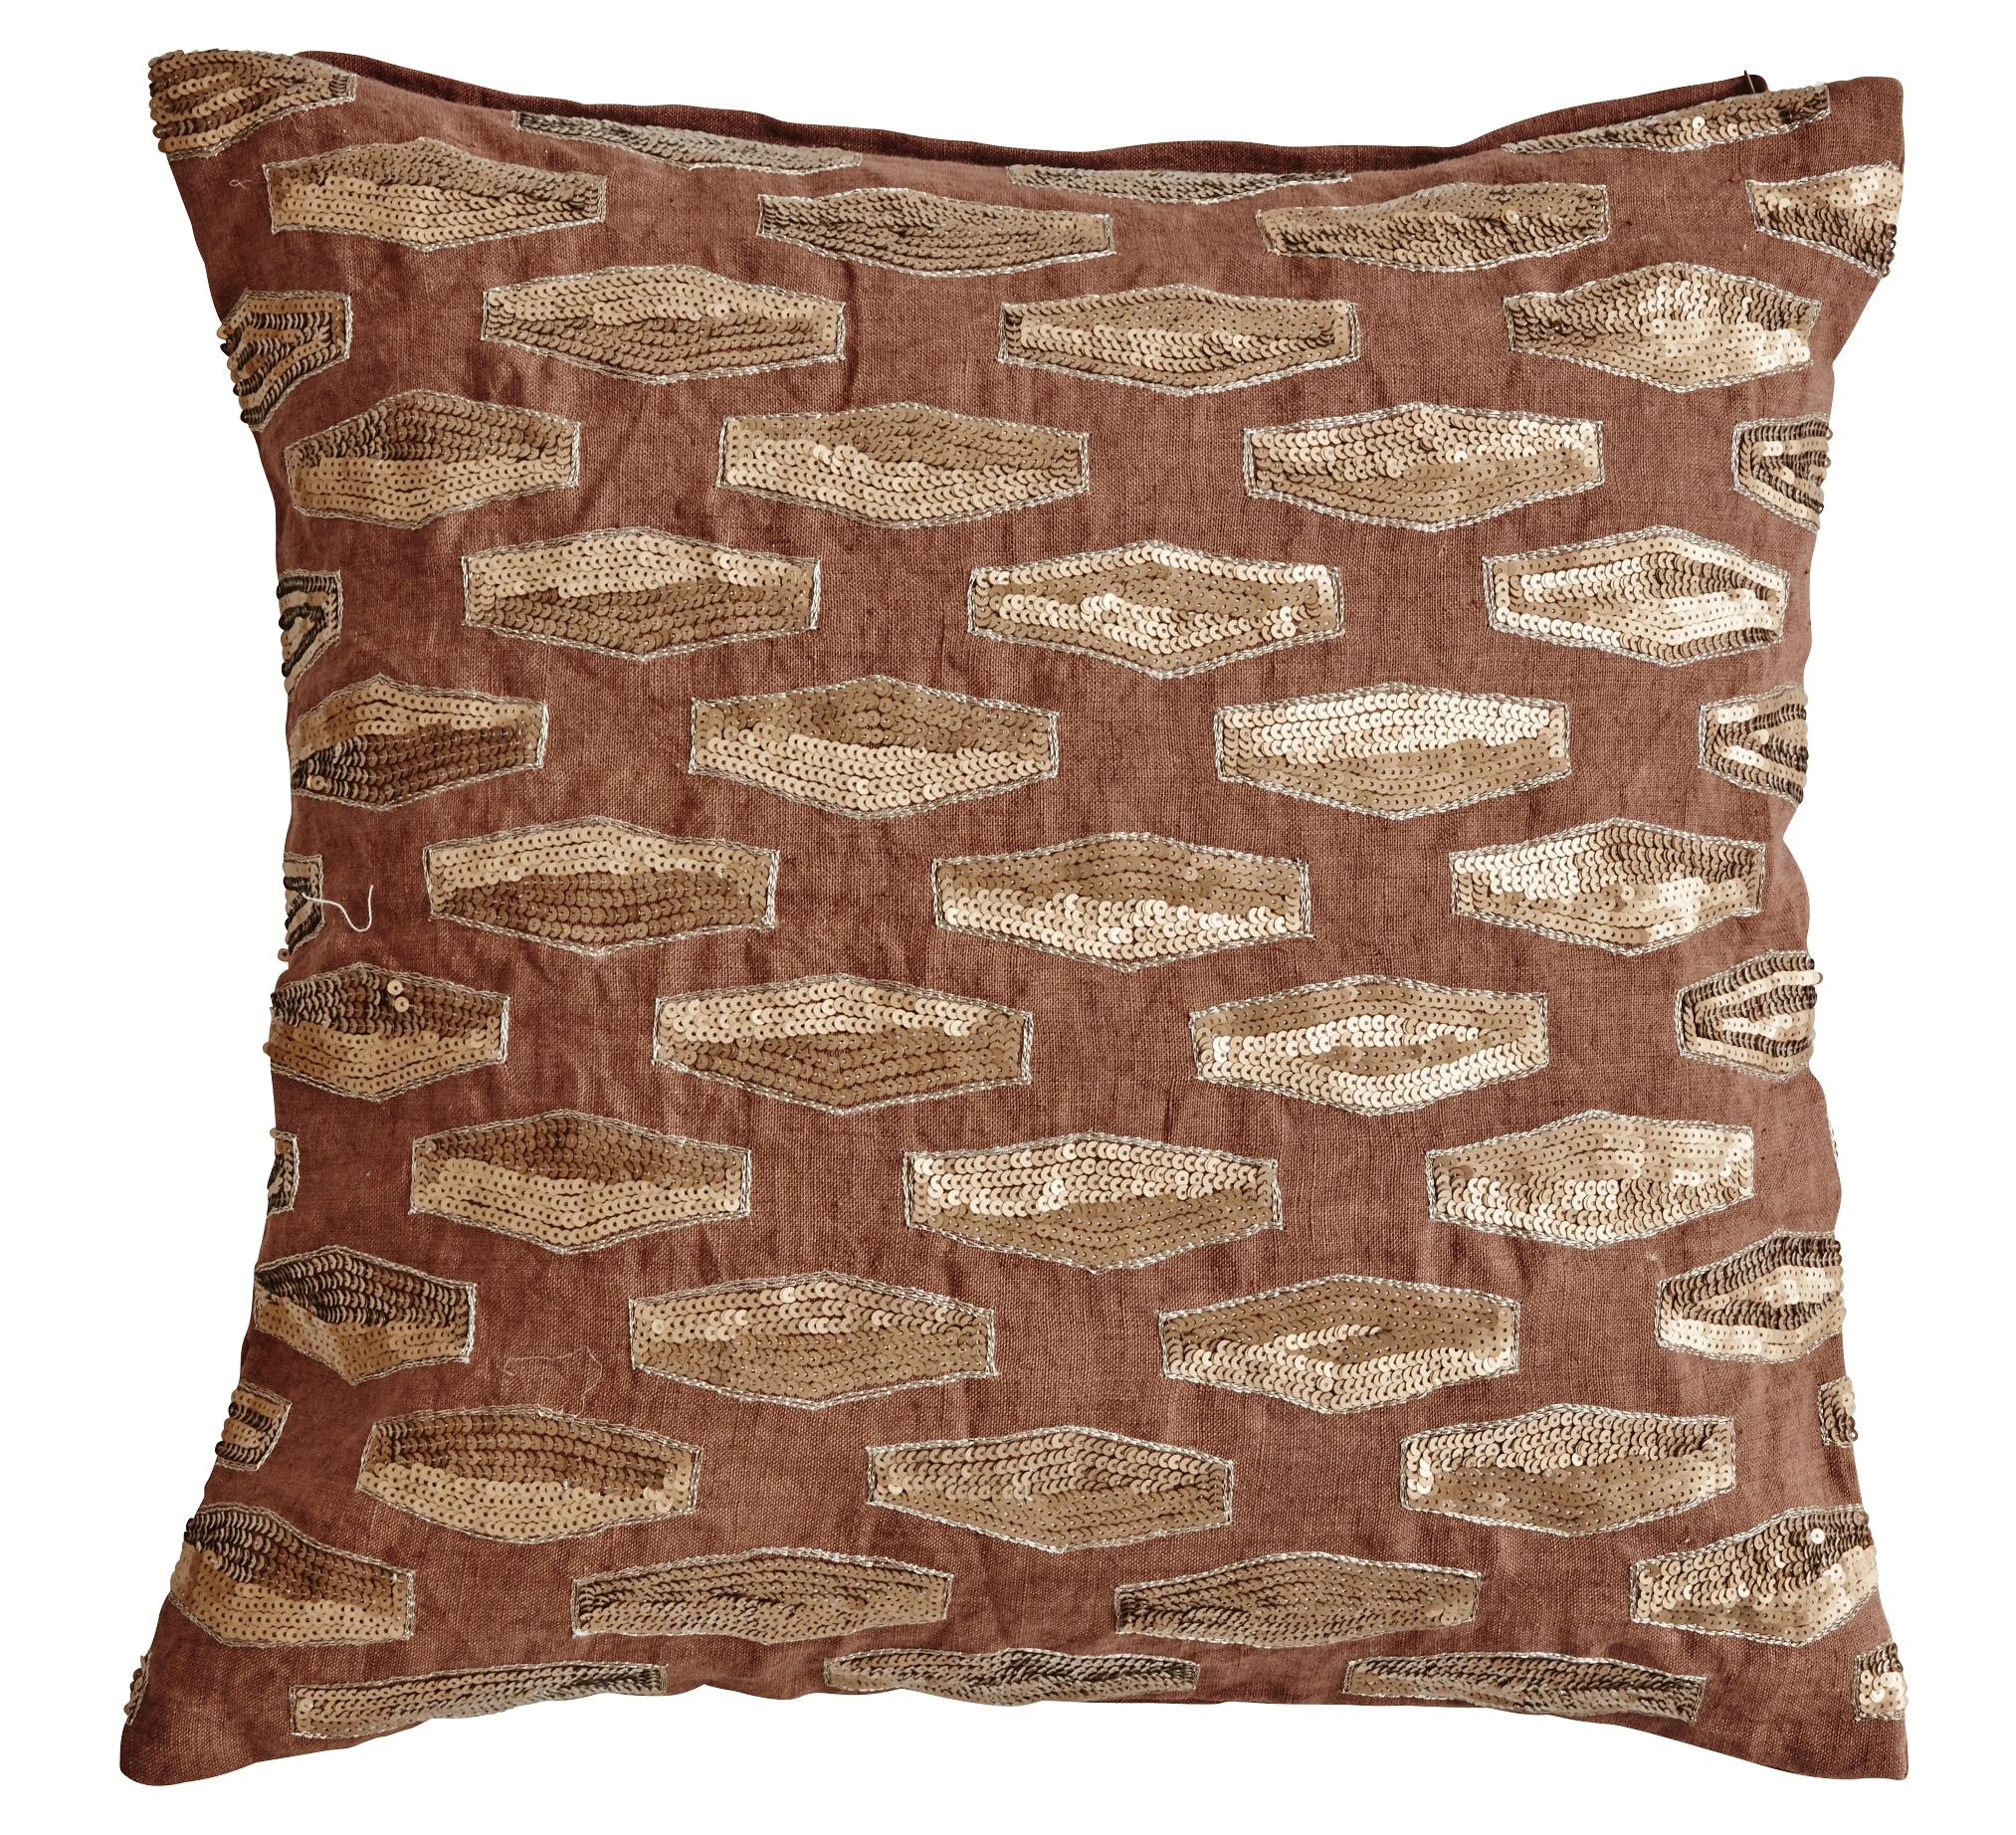 Fifties Cushion Cover Kuddfodral - Caramel